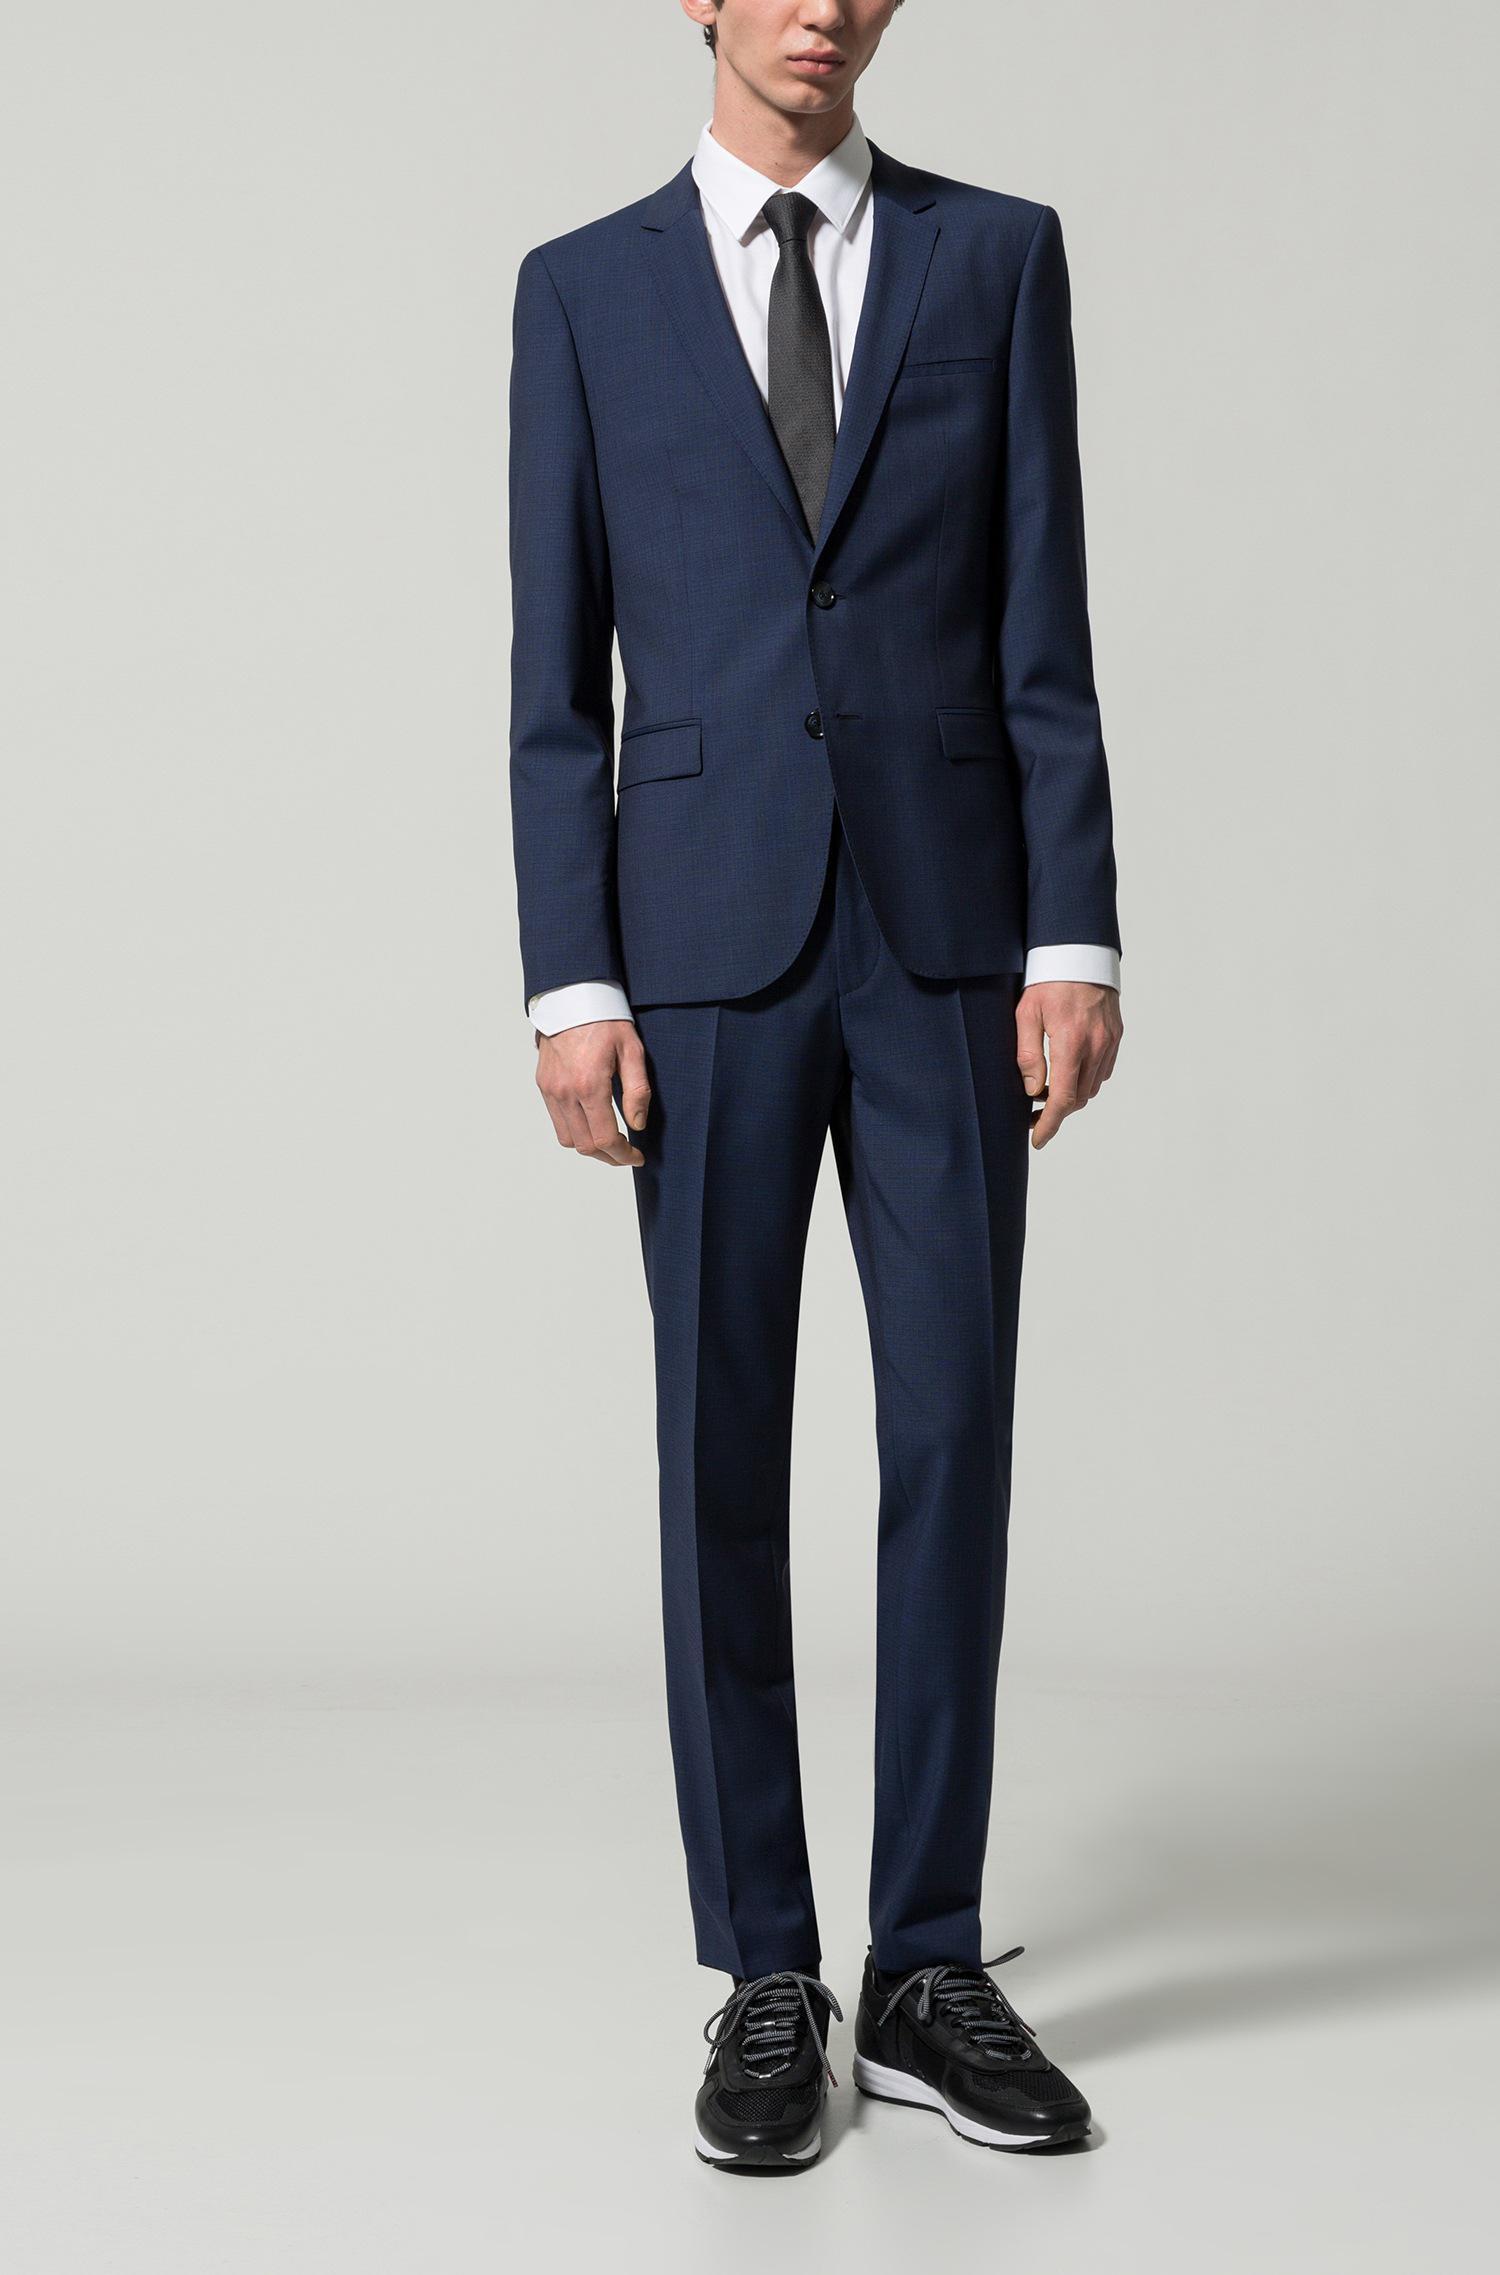 affa645d HUGO Italian Virgin Wool Suit, Extra Slim Fit | Arti/hesten in Blue ...